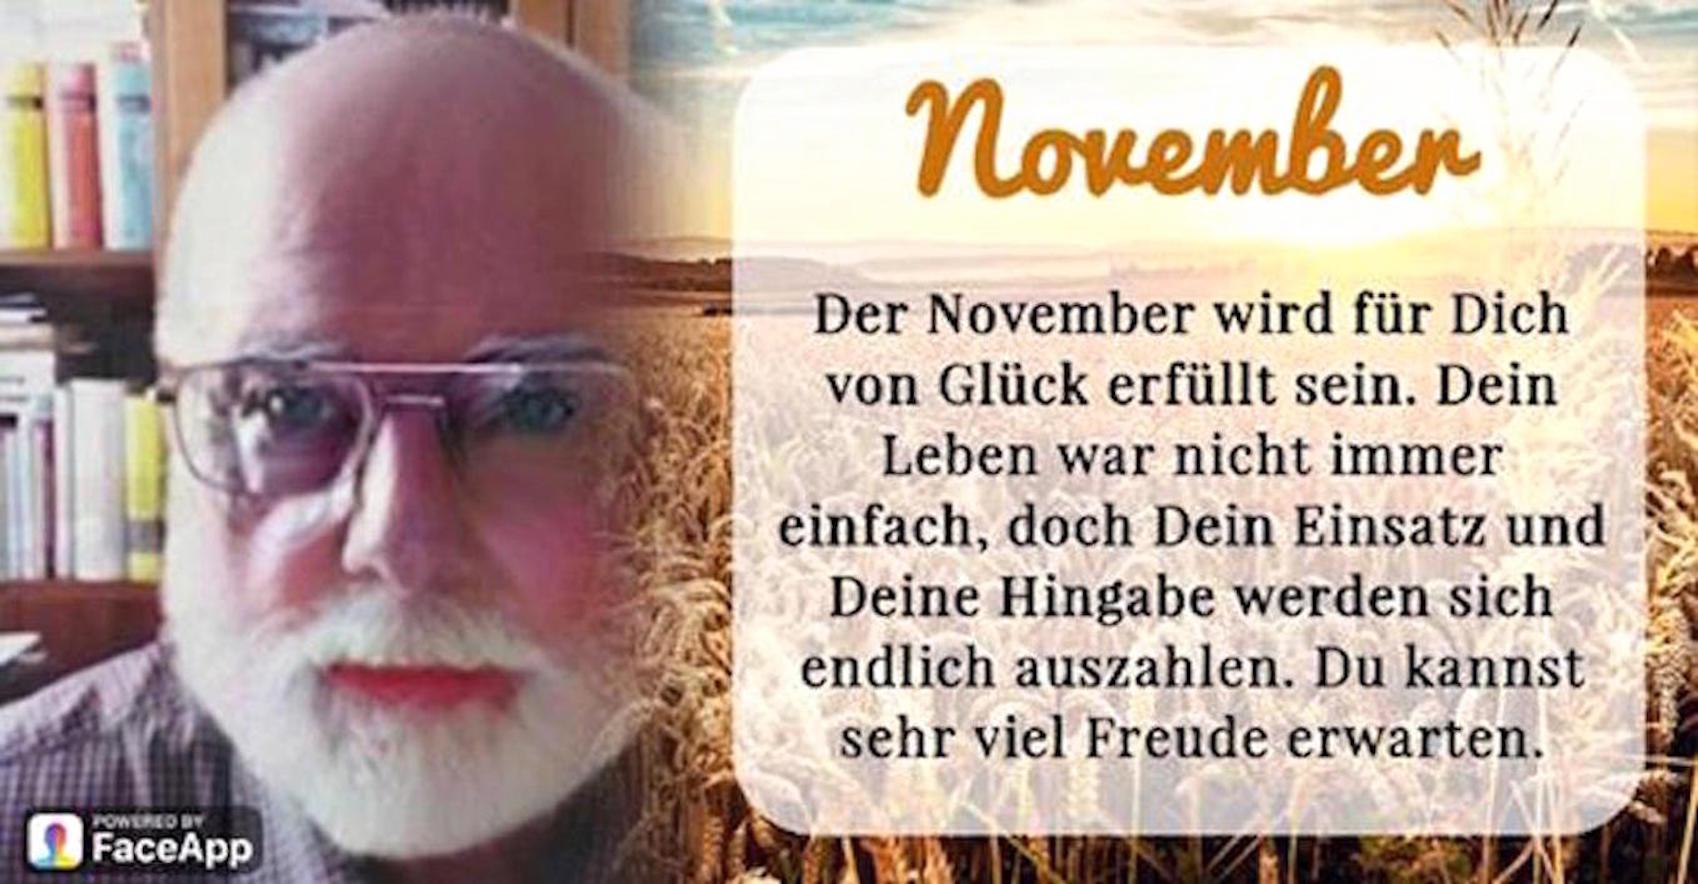 PachT Facebook über mich 2018.10.25 NovemberPrognose